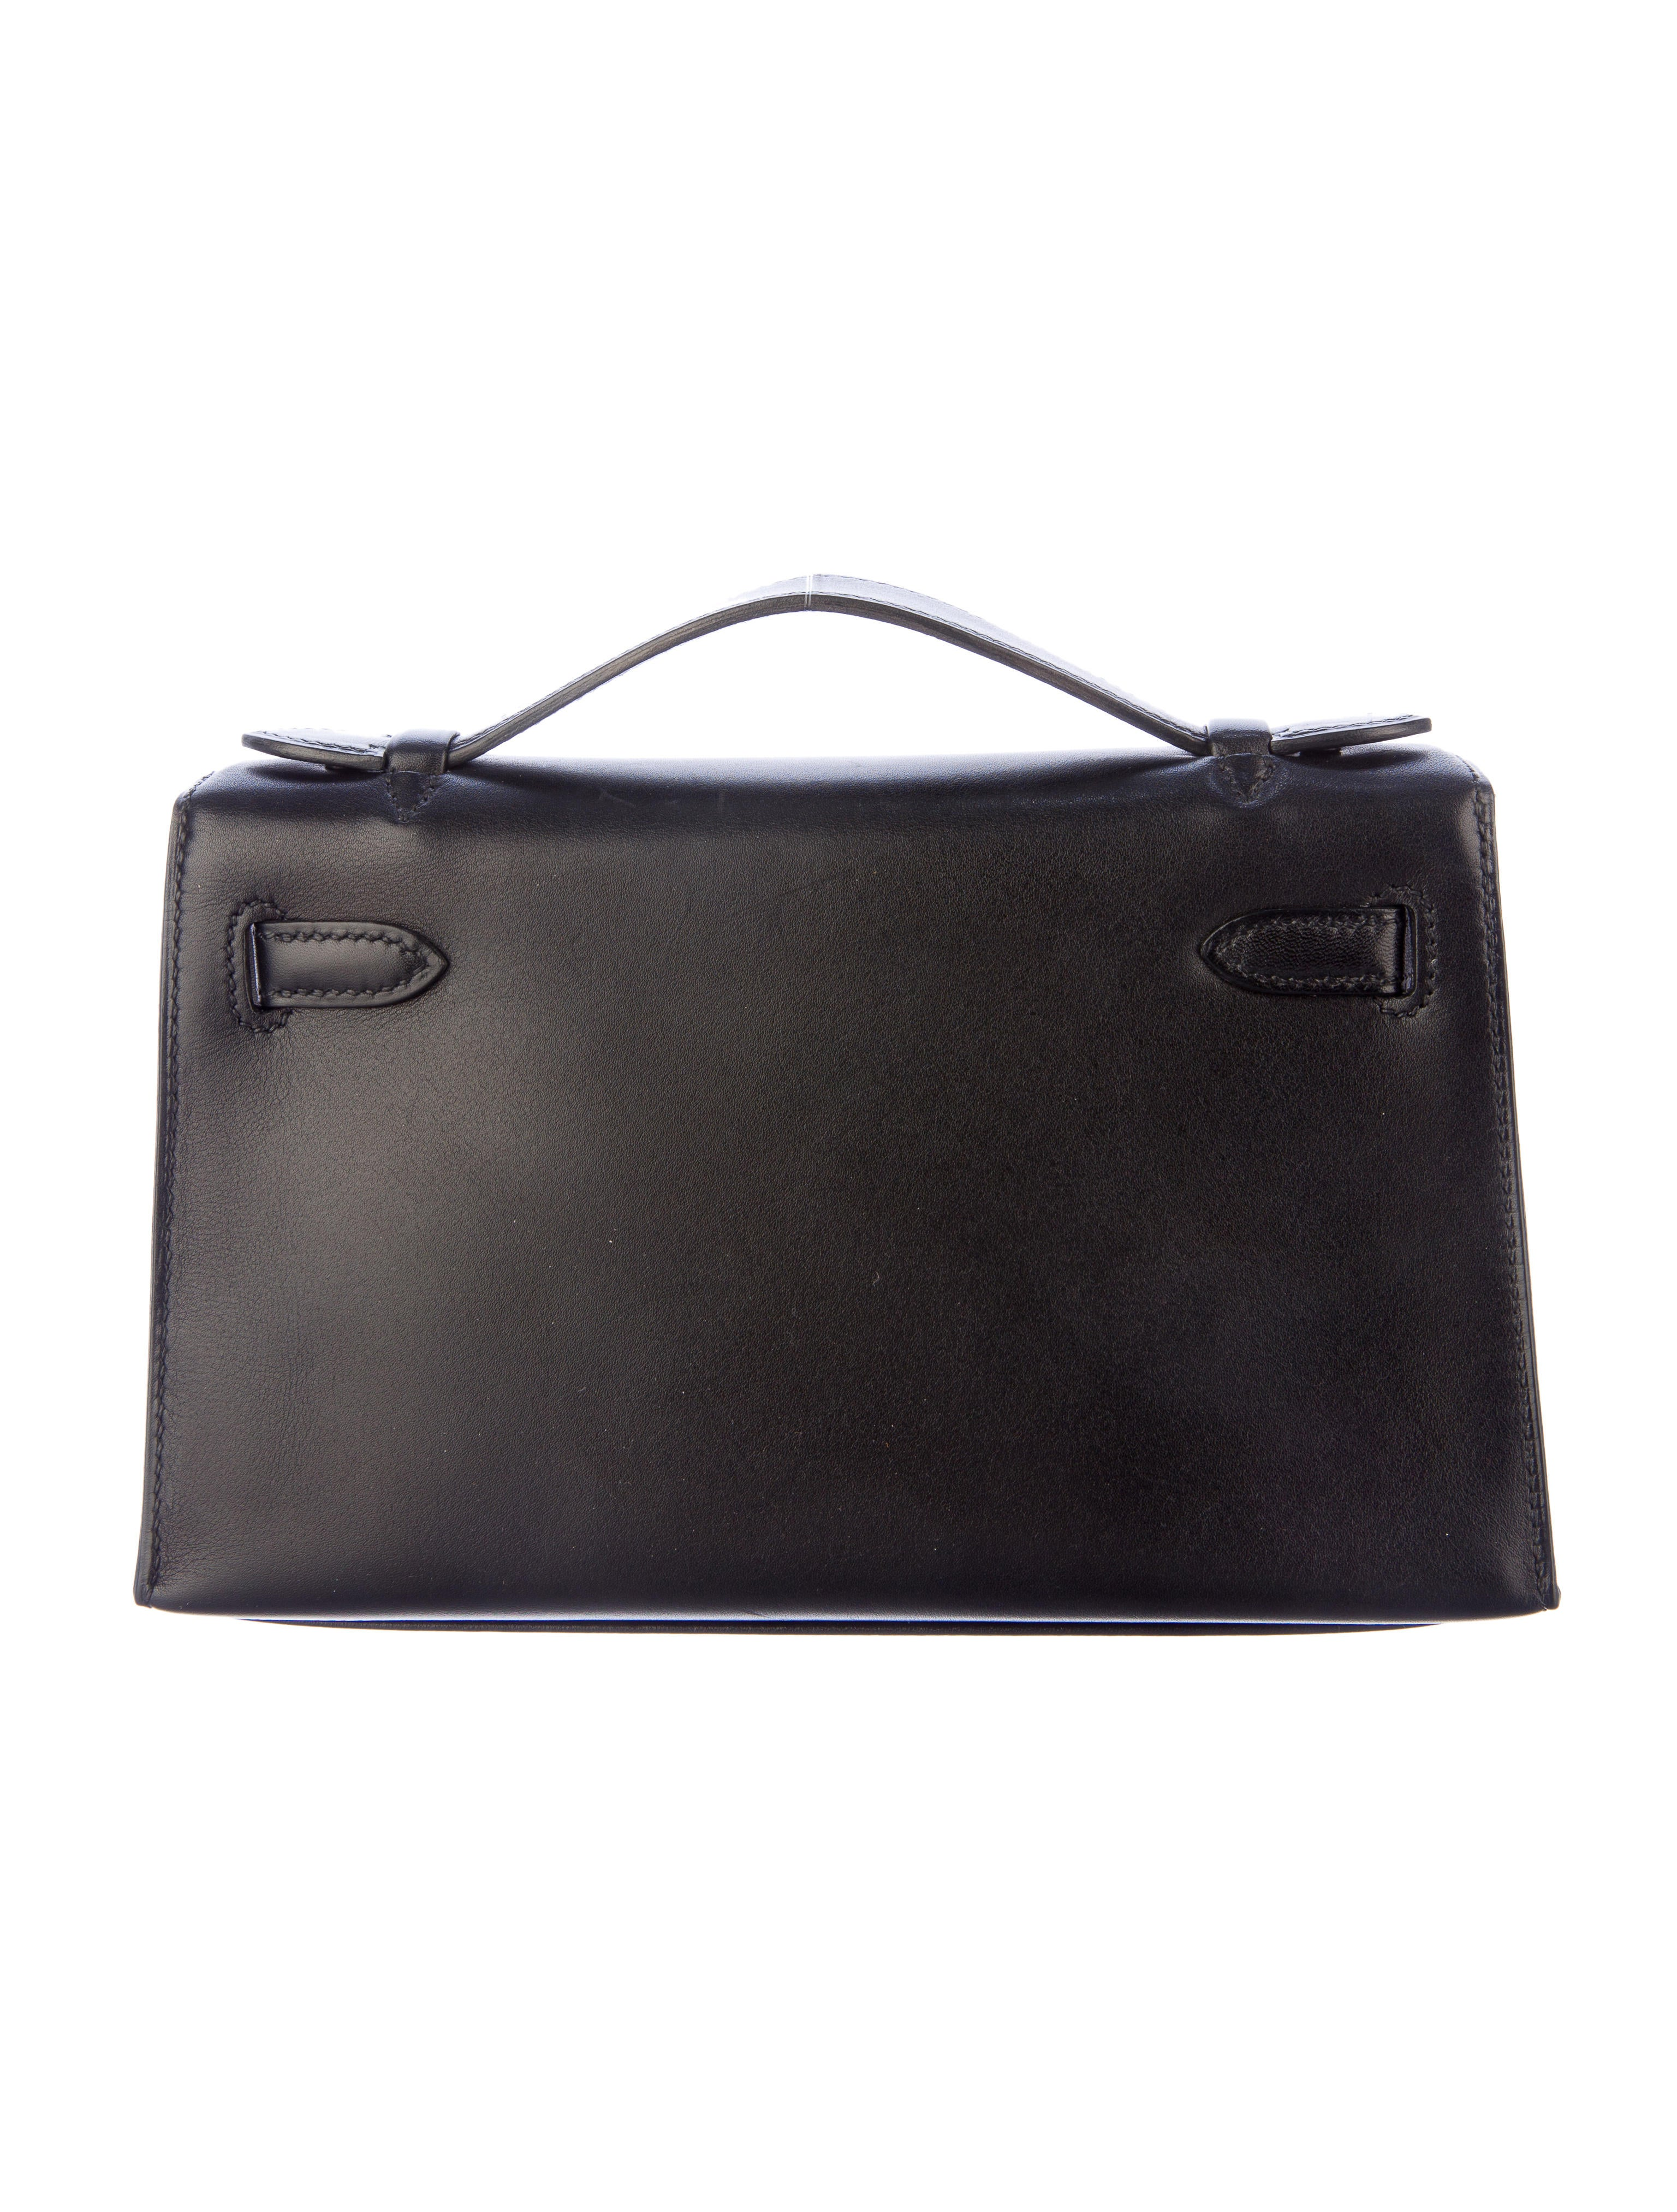 bdea1b0b73 ... coupon code for hermès kelly pochette handbags her30228 the realreal  bcb86 f3a28 discount code for hermes kelly pochette price ...